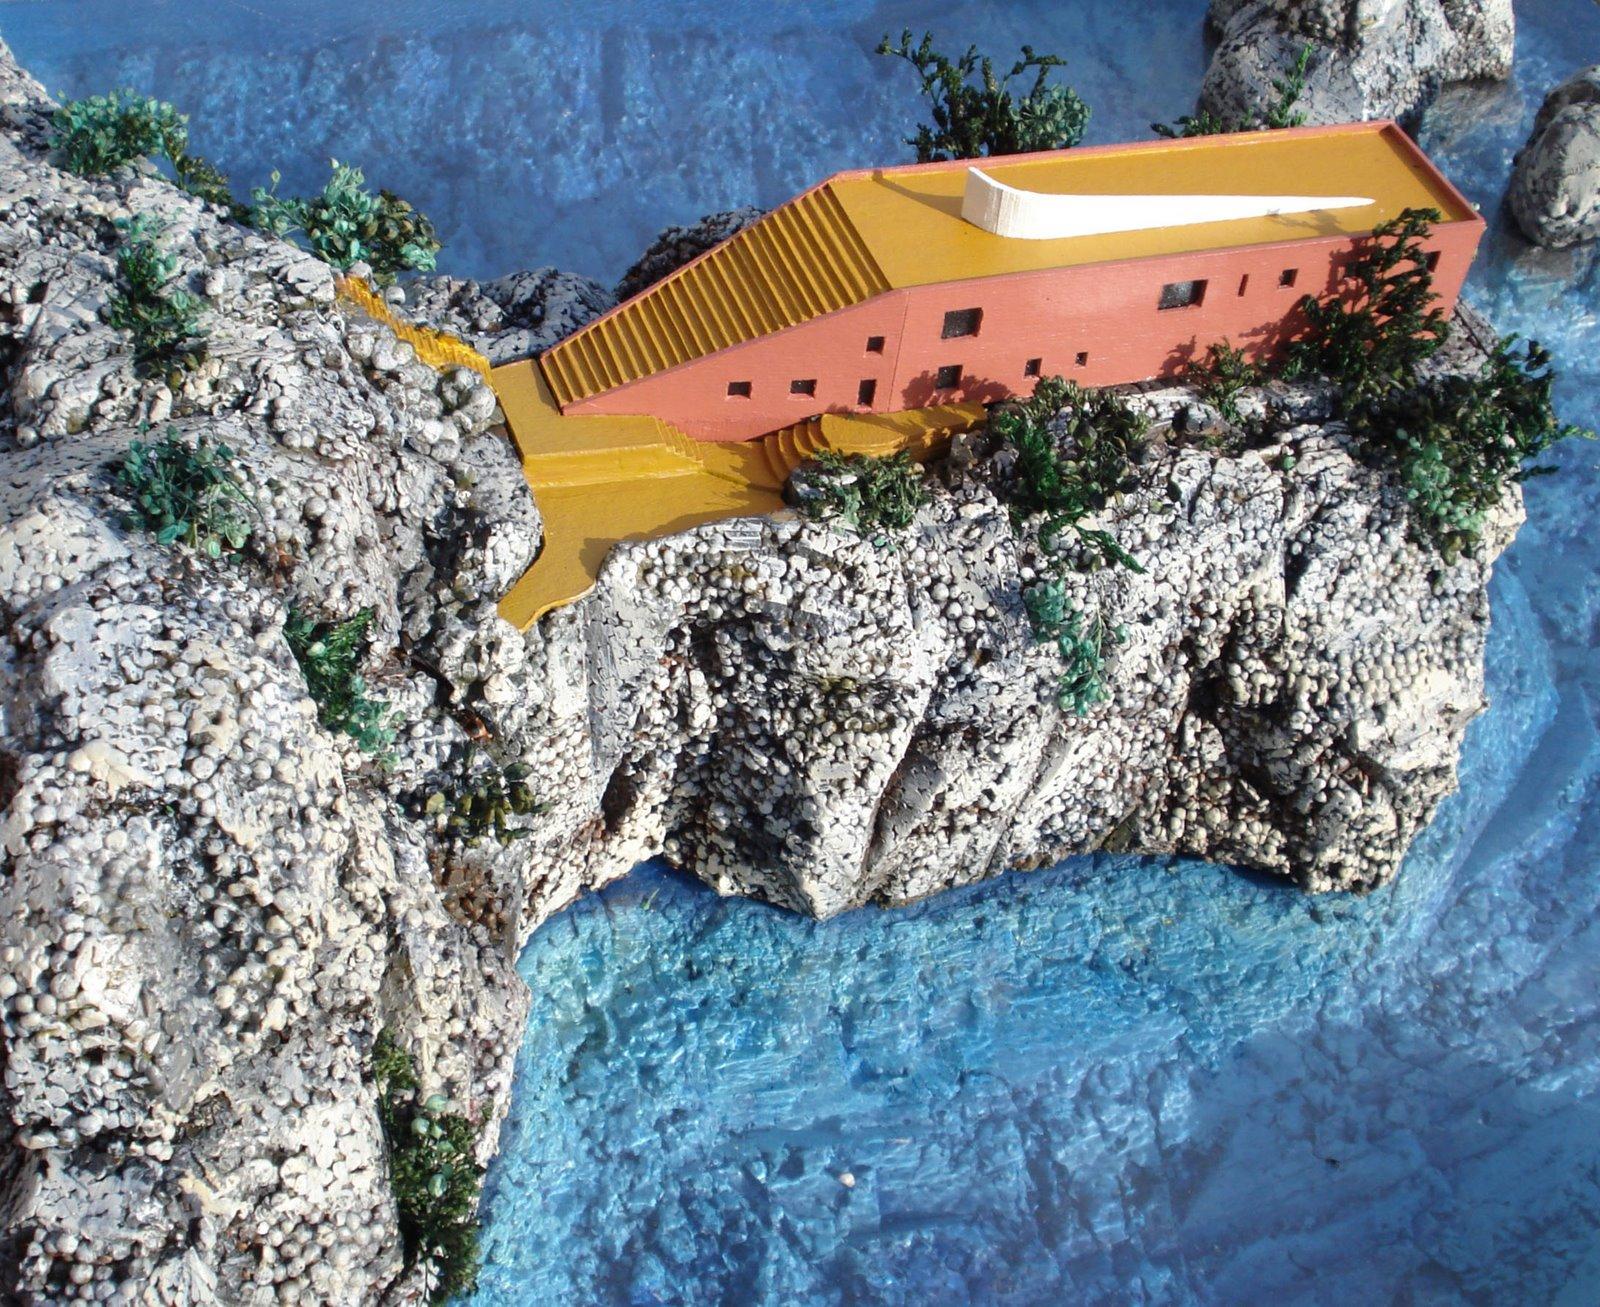 Italian Food Near Me Abandone Building Casa: Casa Malaparte - House Capri